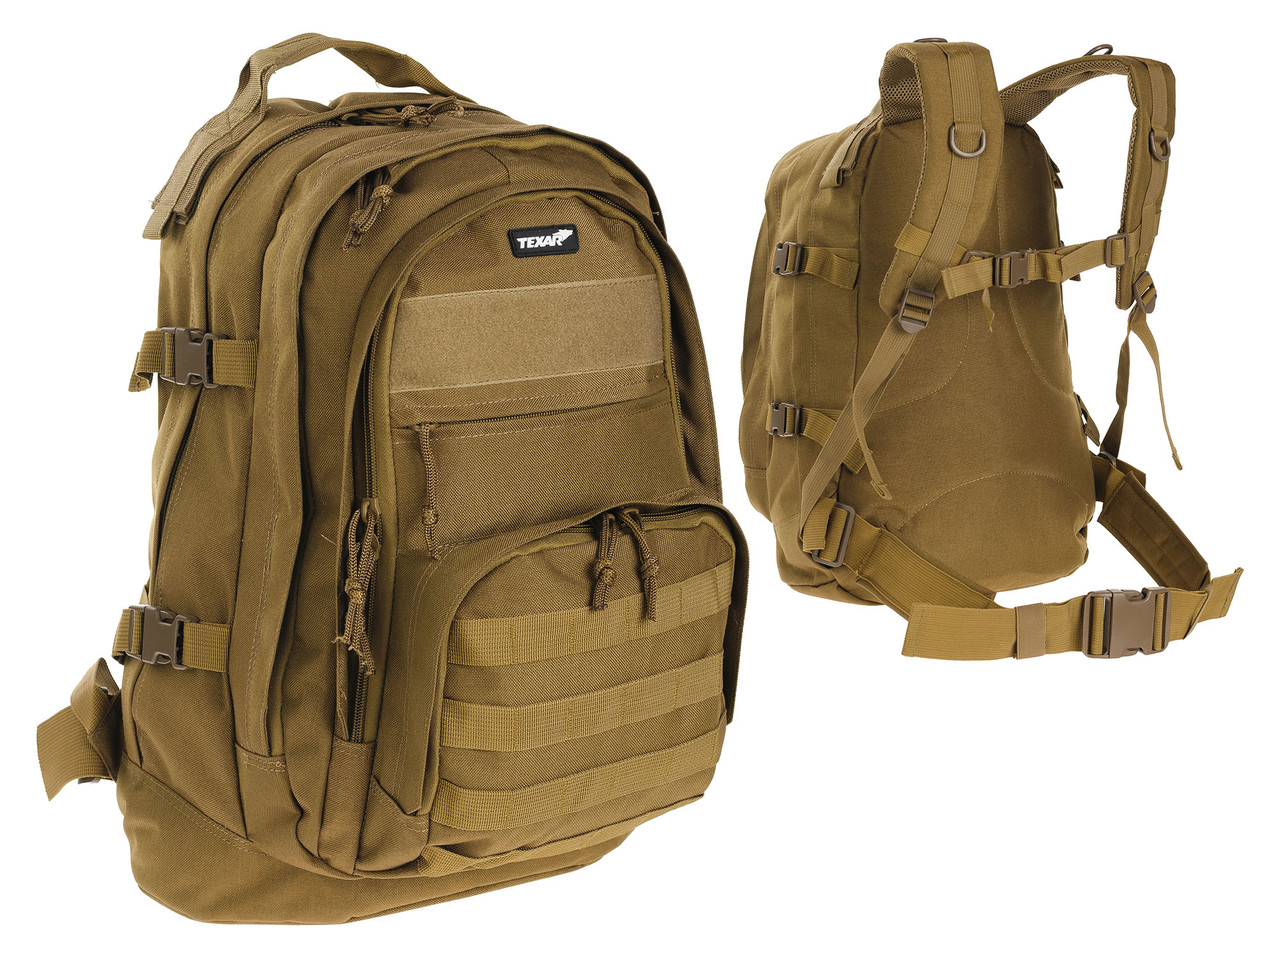 Тактический рюкзак TEXAR CADET 35L COYOTE